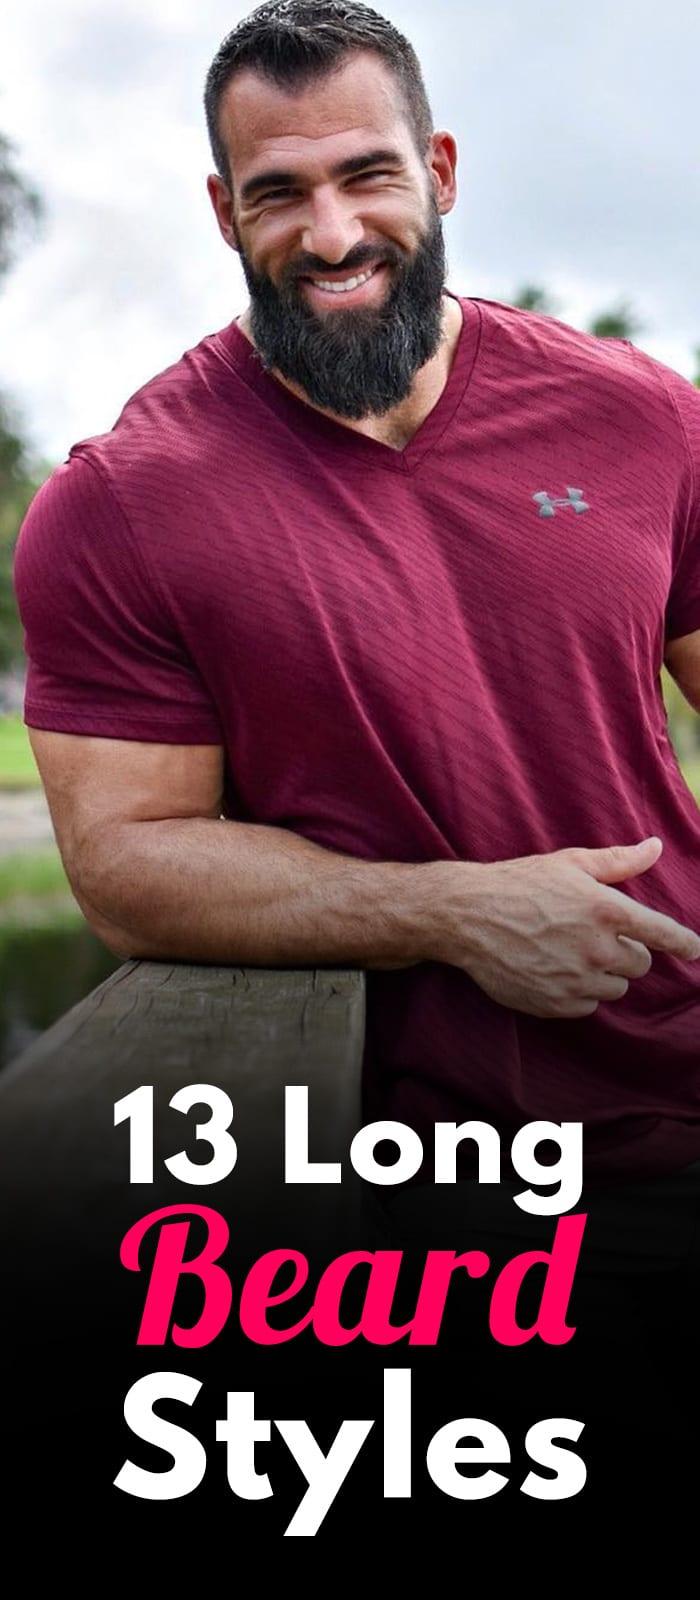 13 Long Beard Styles